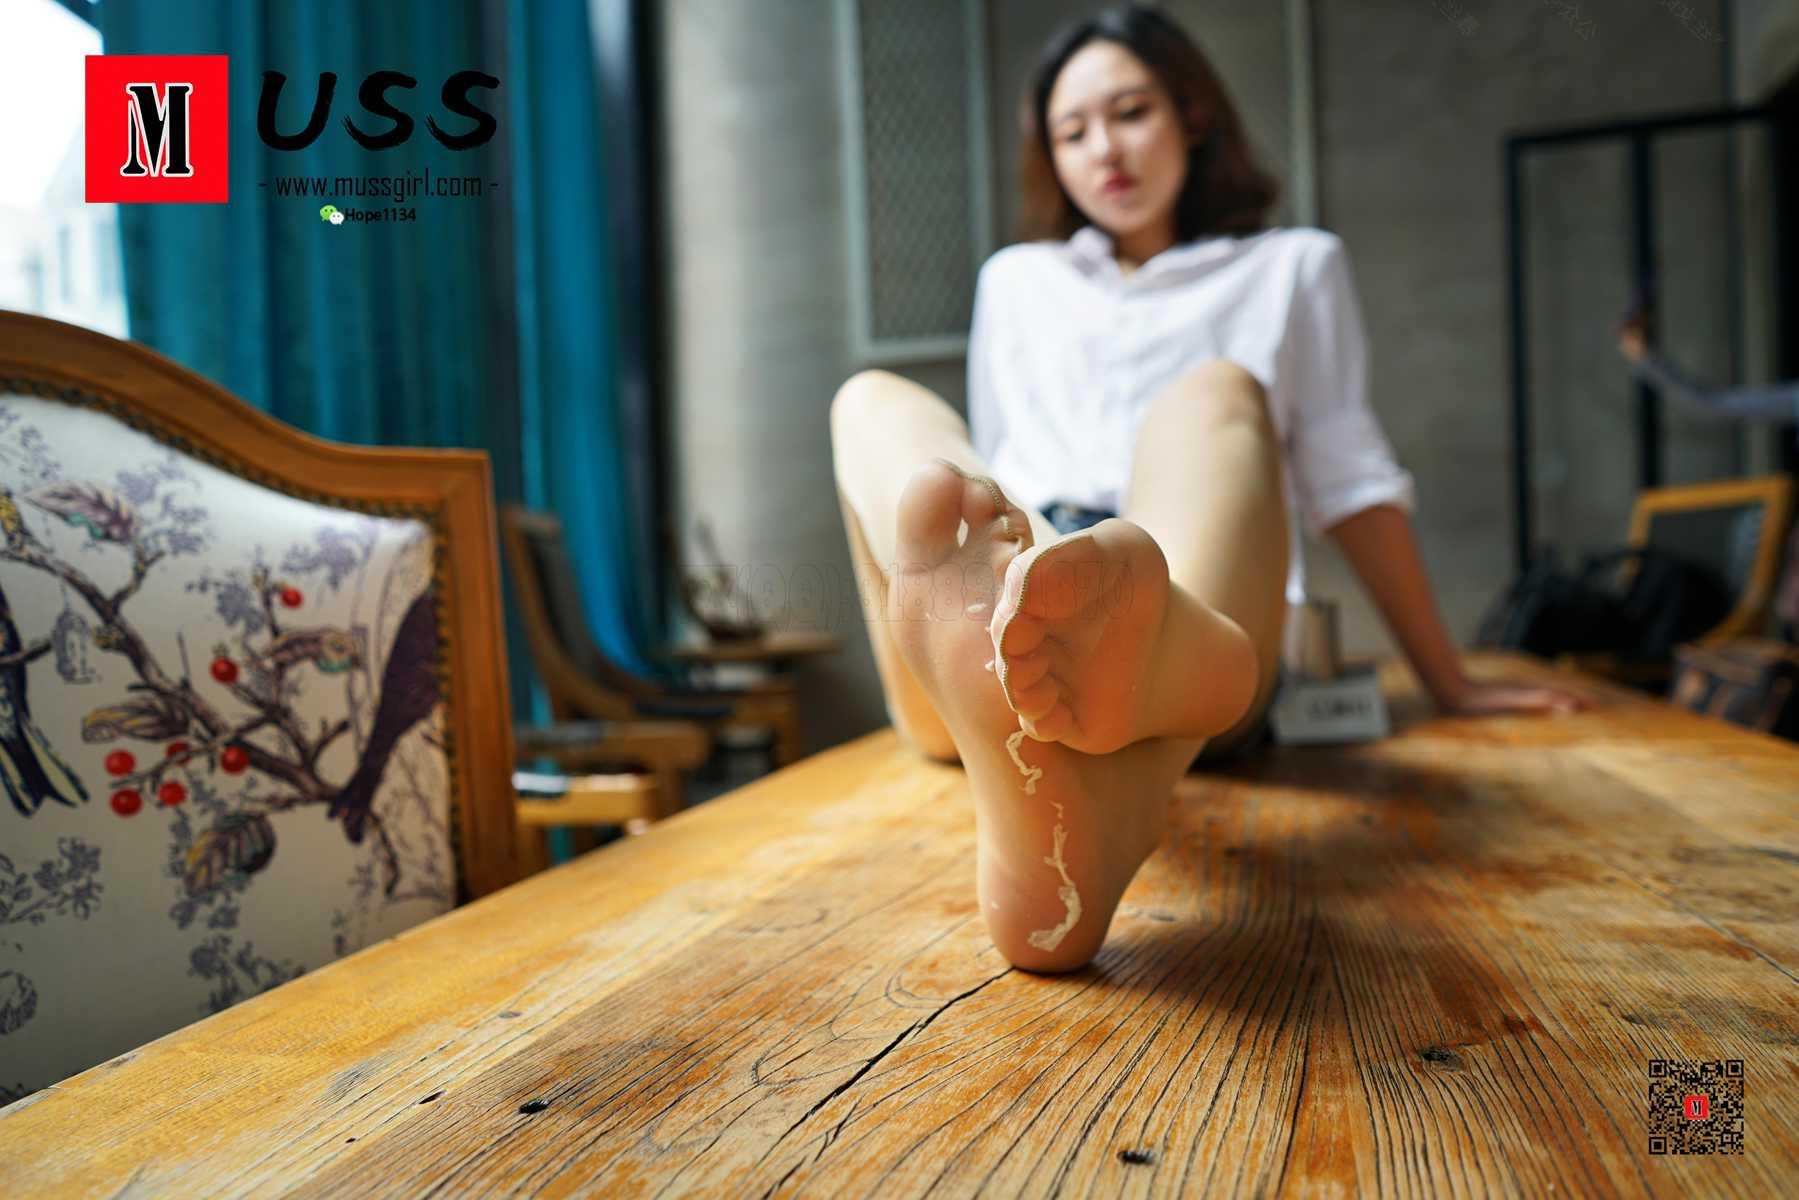 [MussGirl]慕丝女郎 No.036 很酷吧 是她的靴子太热了